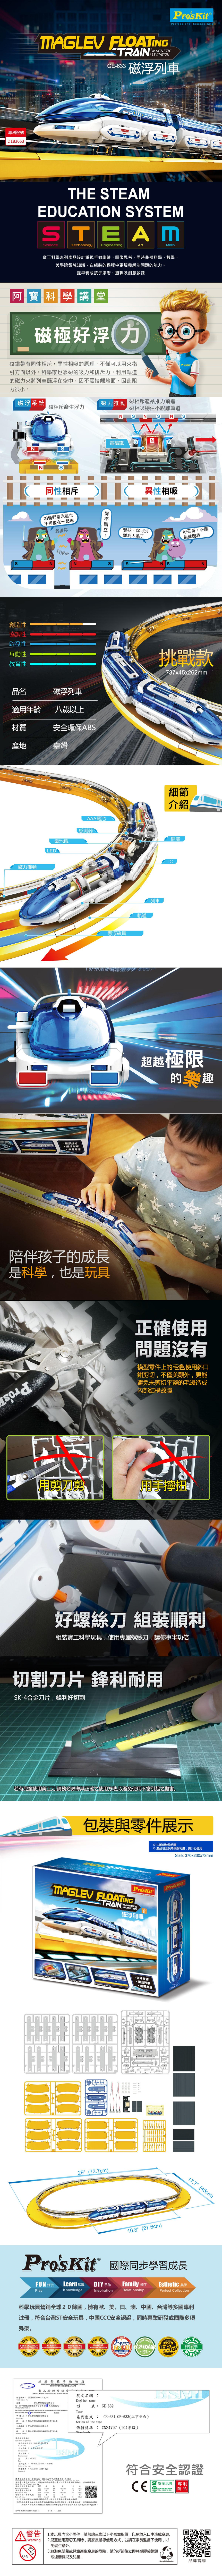 MAGLEV FLOATING TRAIN 磁浮列車含模型工具組,適用年齡8歲以上,安全環保材質,超越極限的樂趣,陪伴孩子的成長科學,提供專屬螺絲刀,可組裝順利.